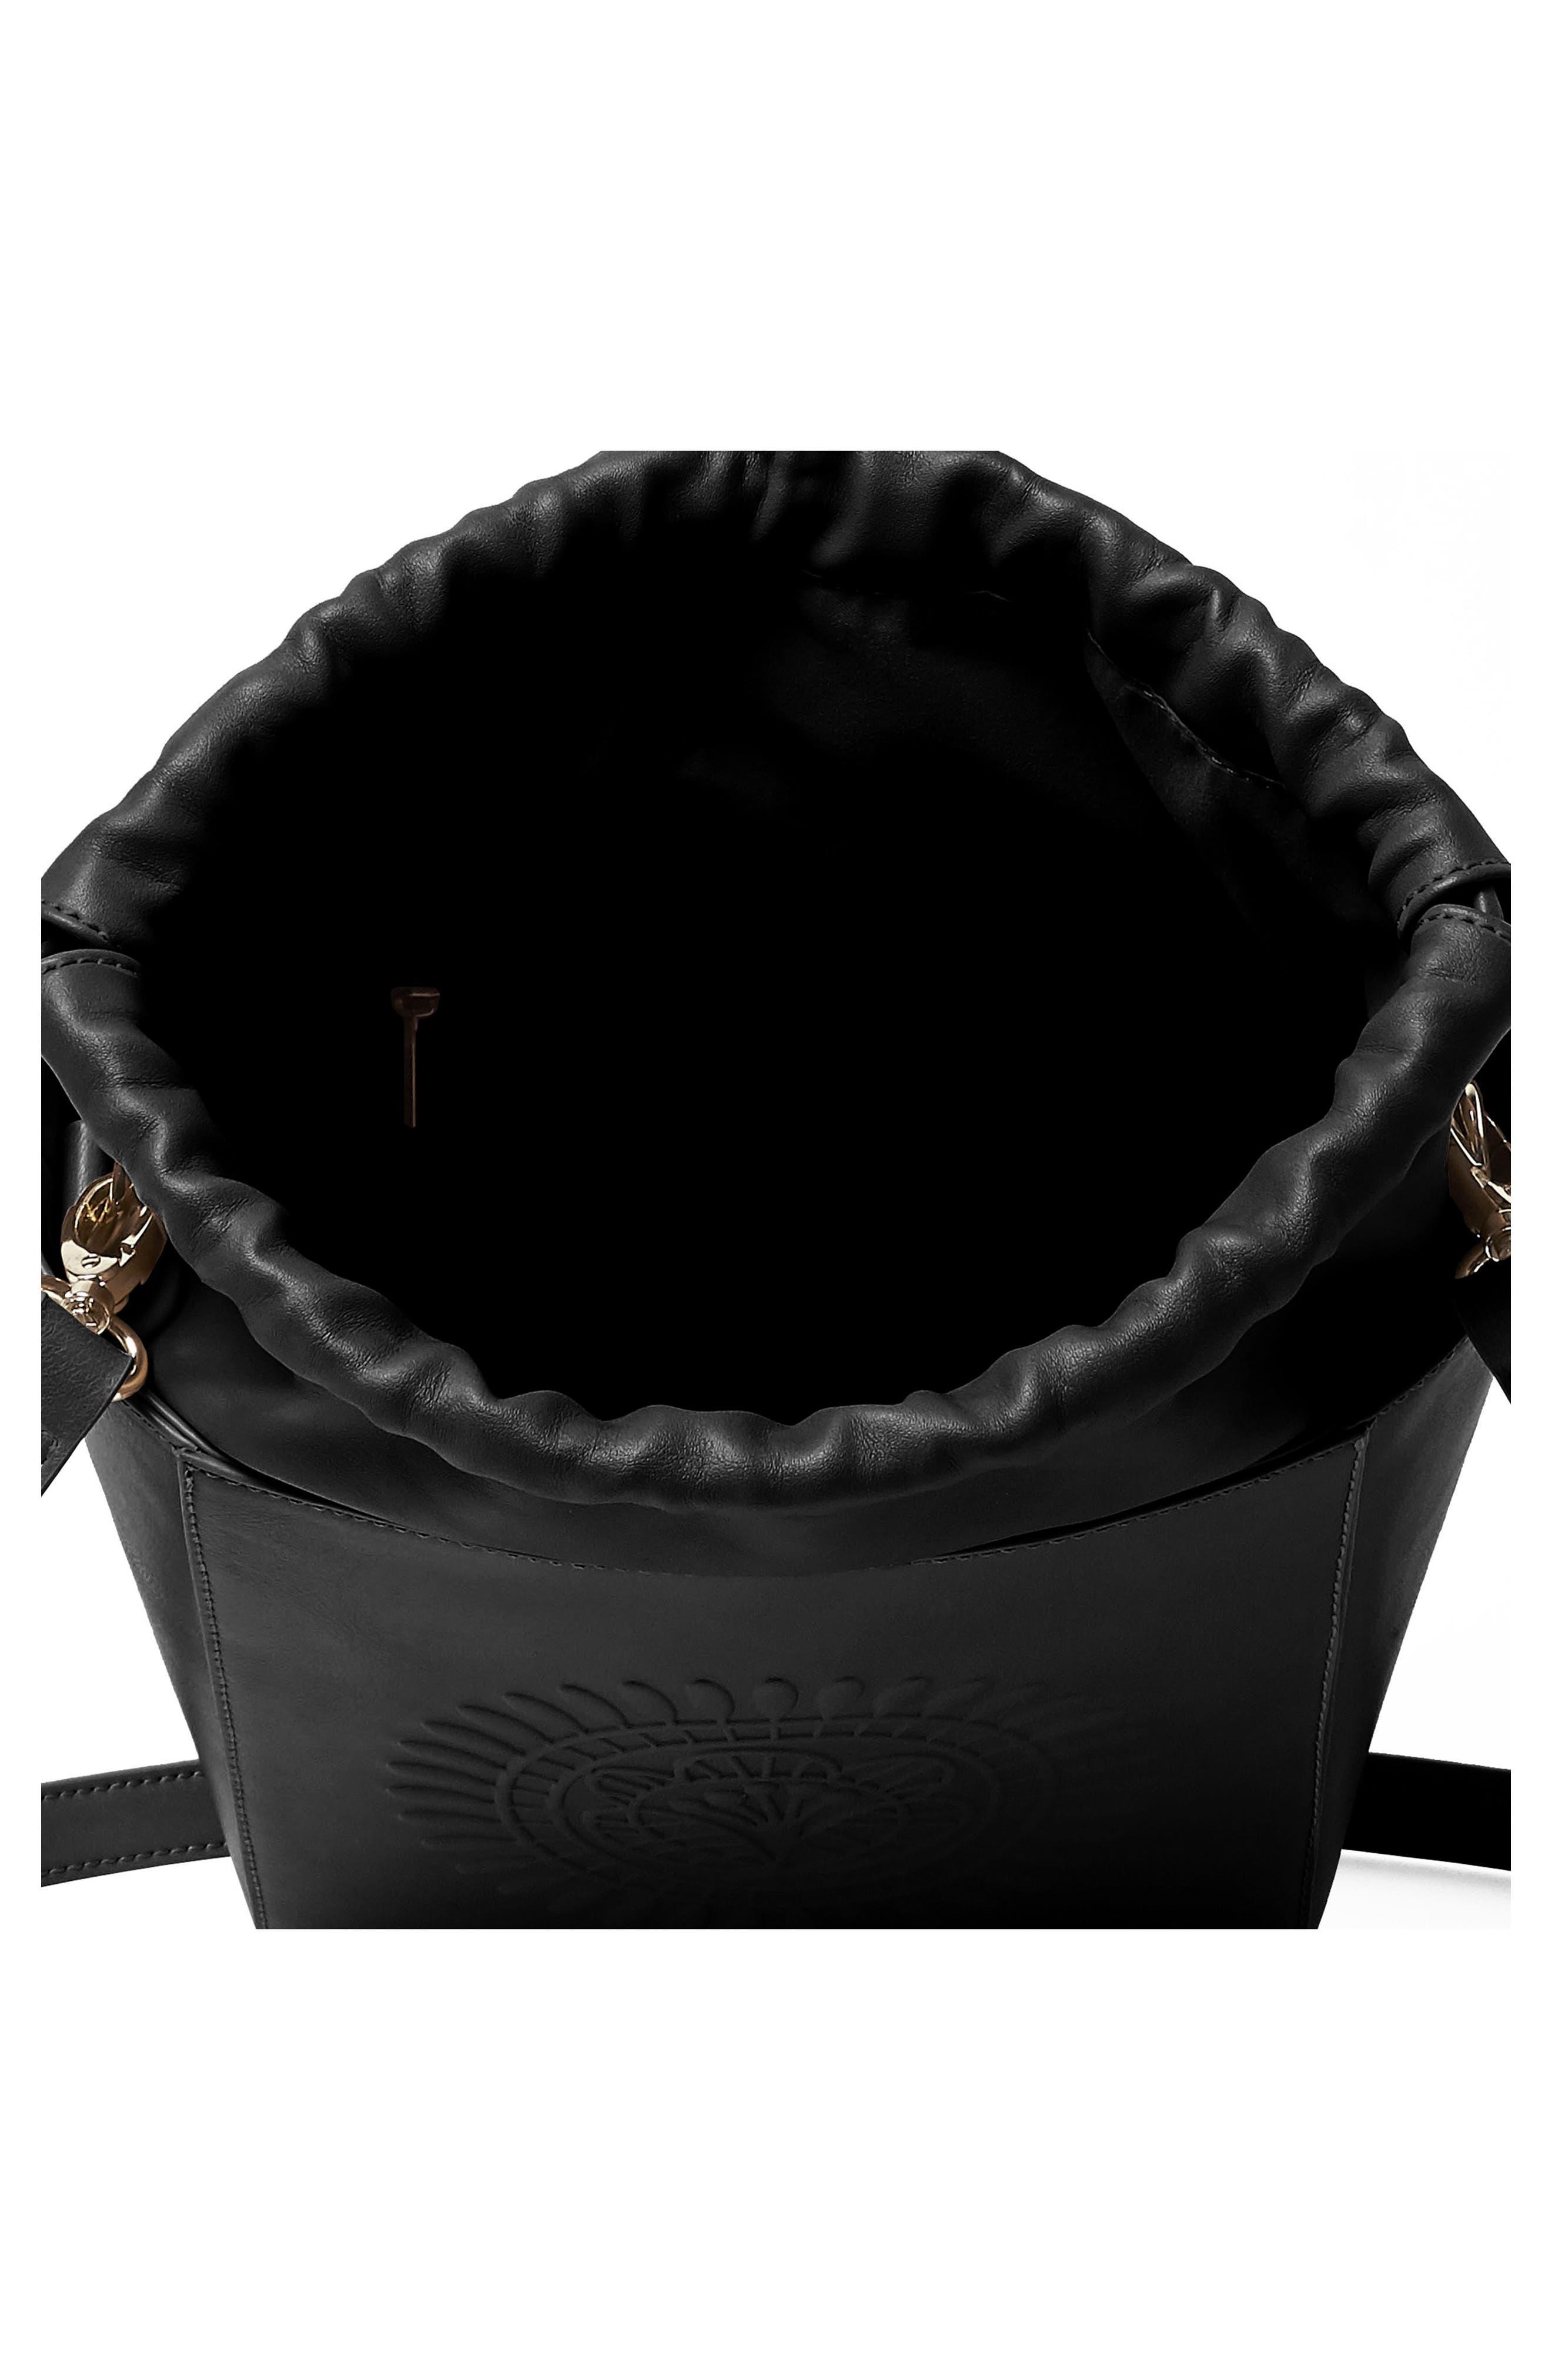 Wanderer Vegan Leather Bucket Bag,                             Alternate thumbnail 2, color,                             001